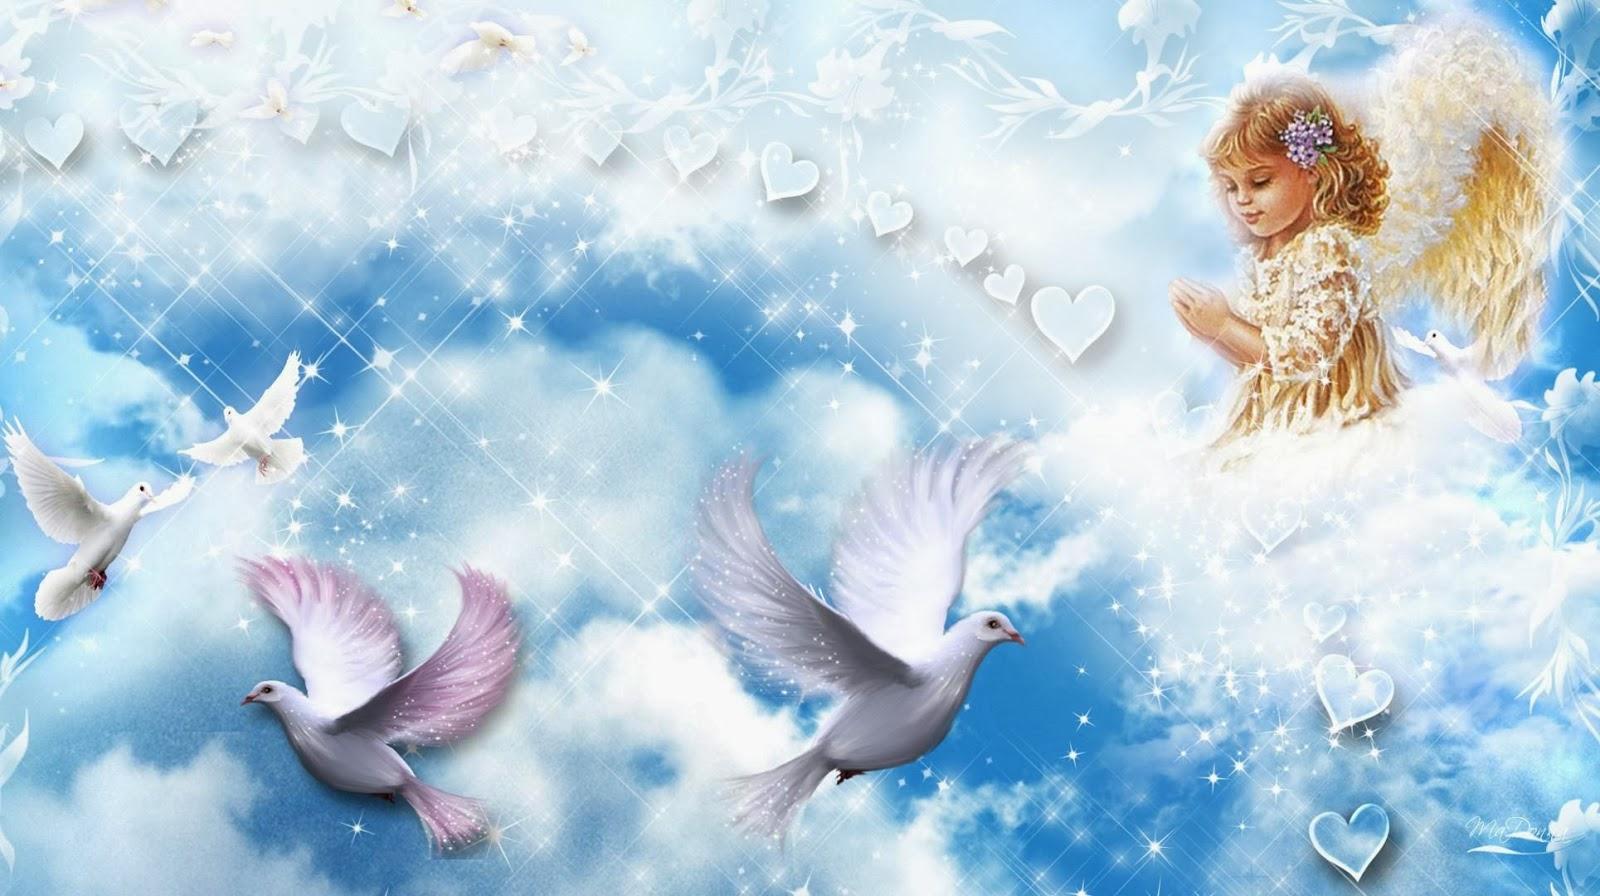 Angels and doves wallpaper   beautiful desktop wallpapers 2014 1600x896